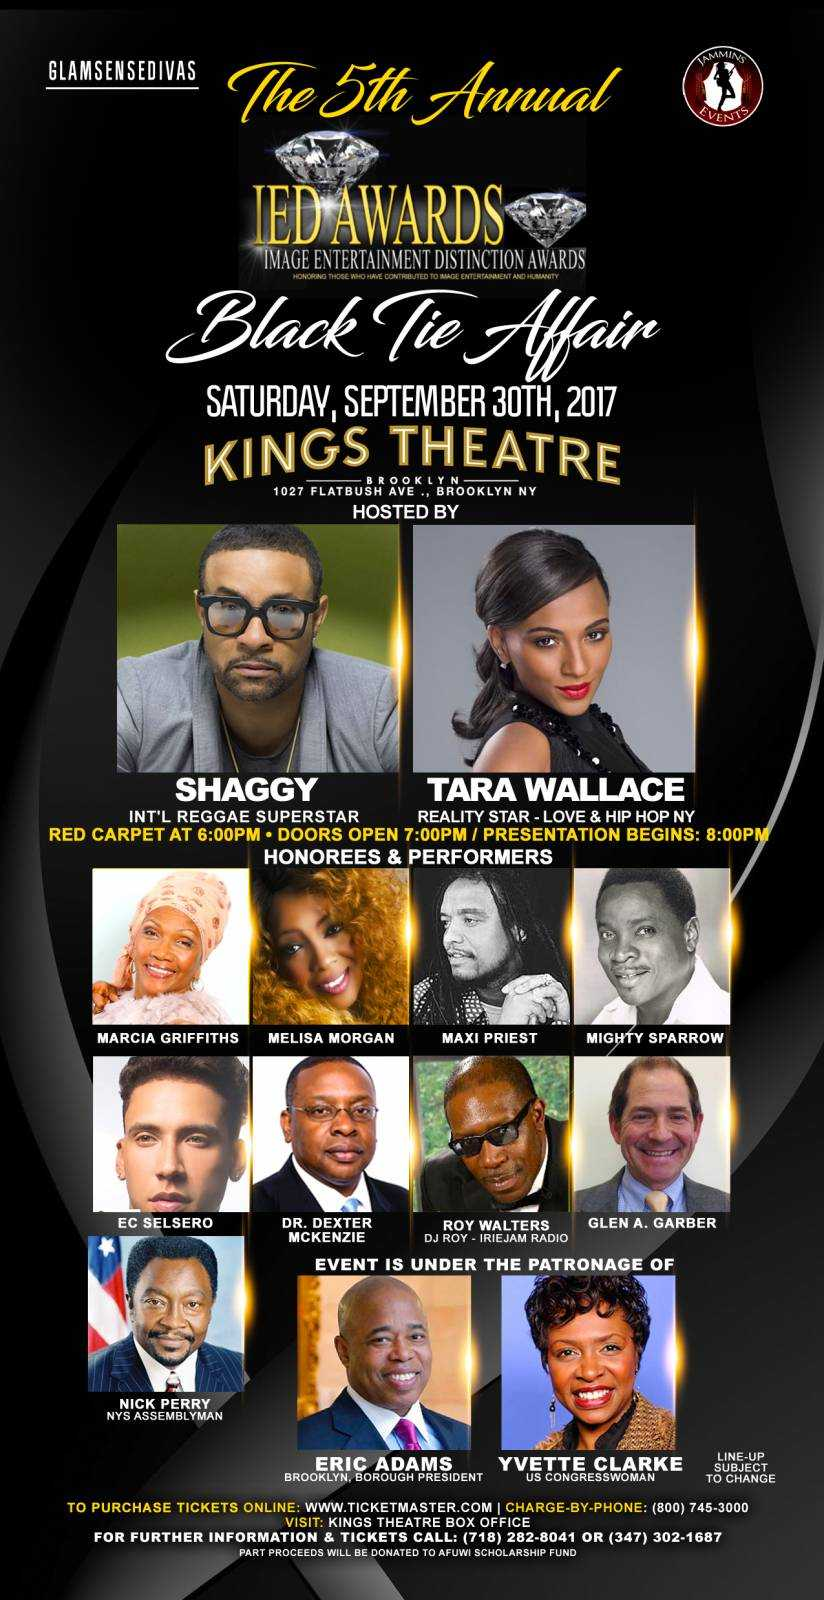 Shaggy and #LHHNY Tara Wallace to Host Image Entertainment Distinction Awards 9/30